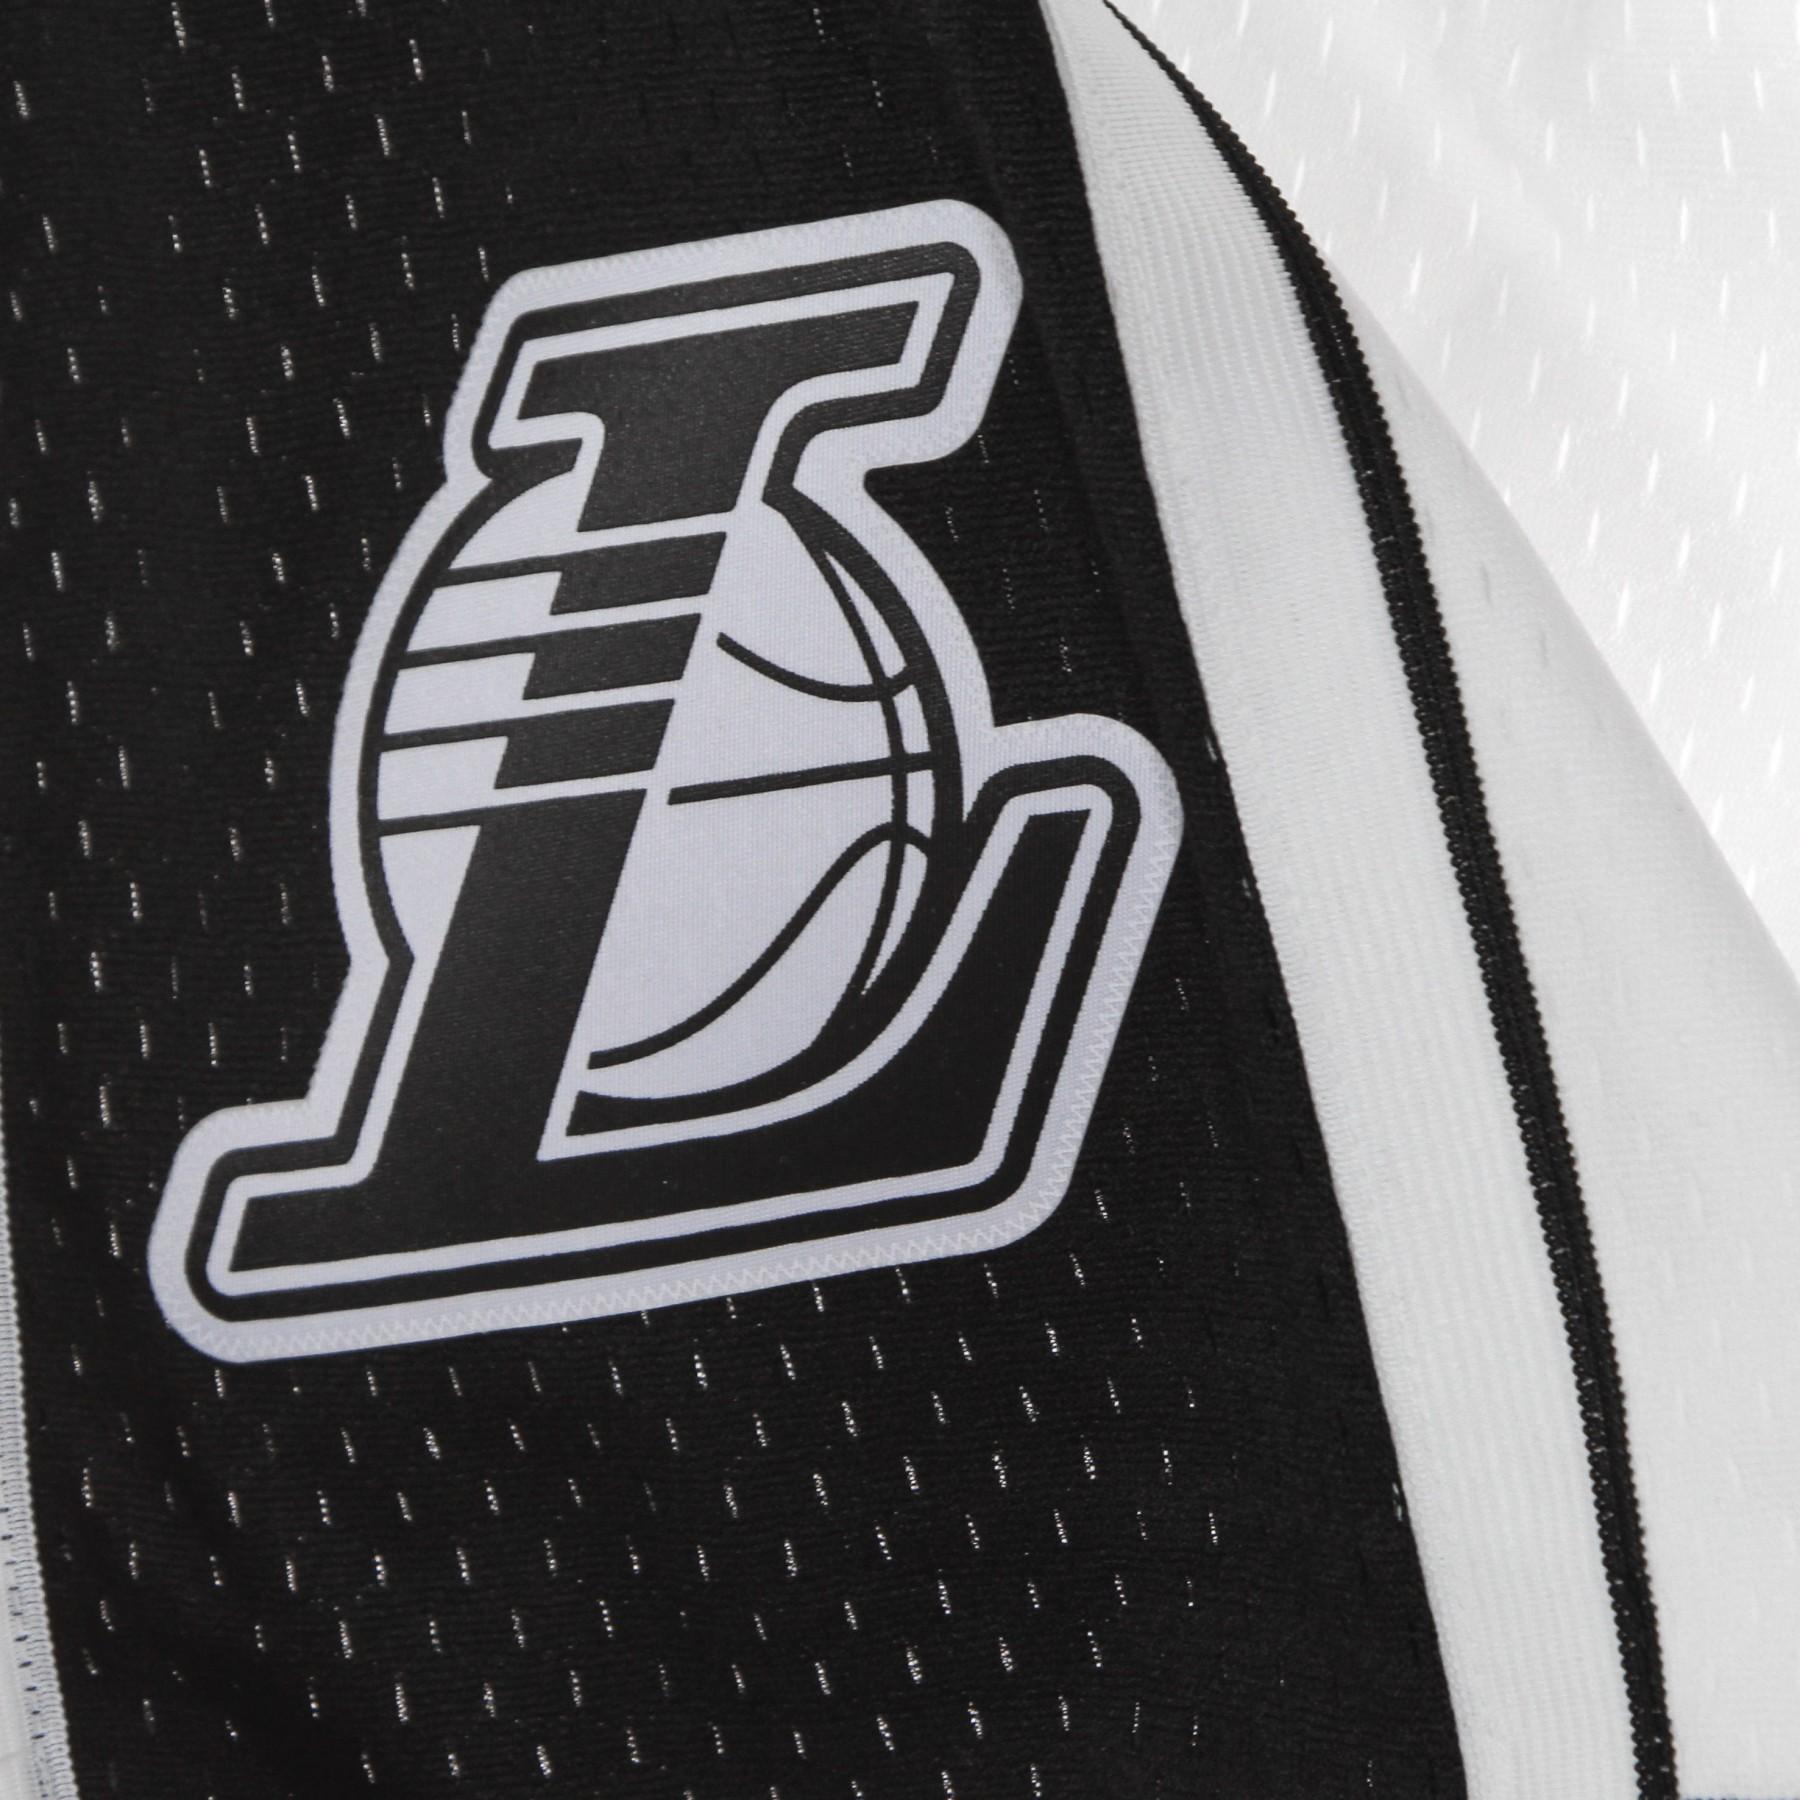 pantaloncino basket uomo nba white black swingman shorts hardwood classics loslak XL